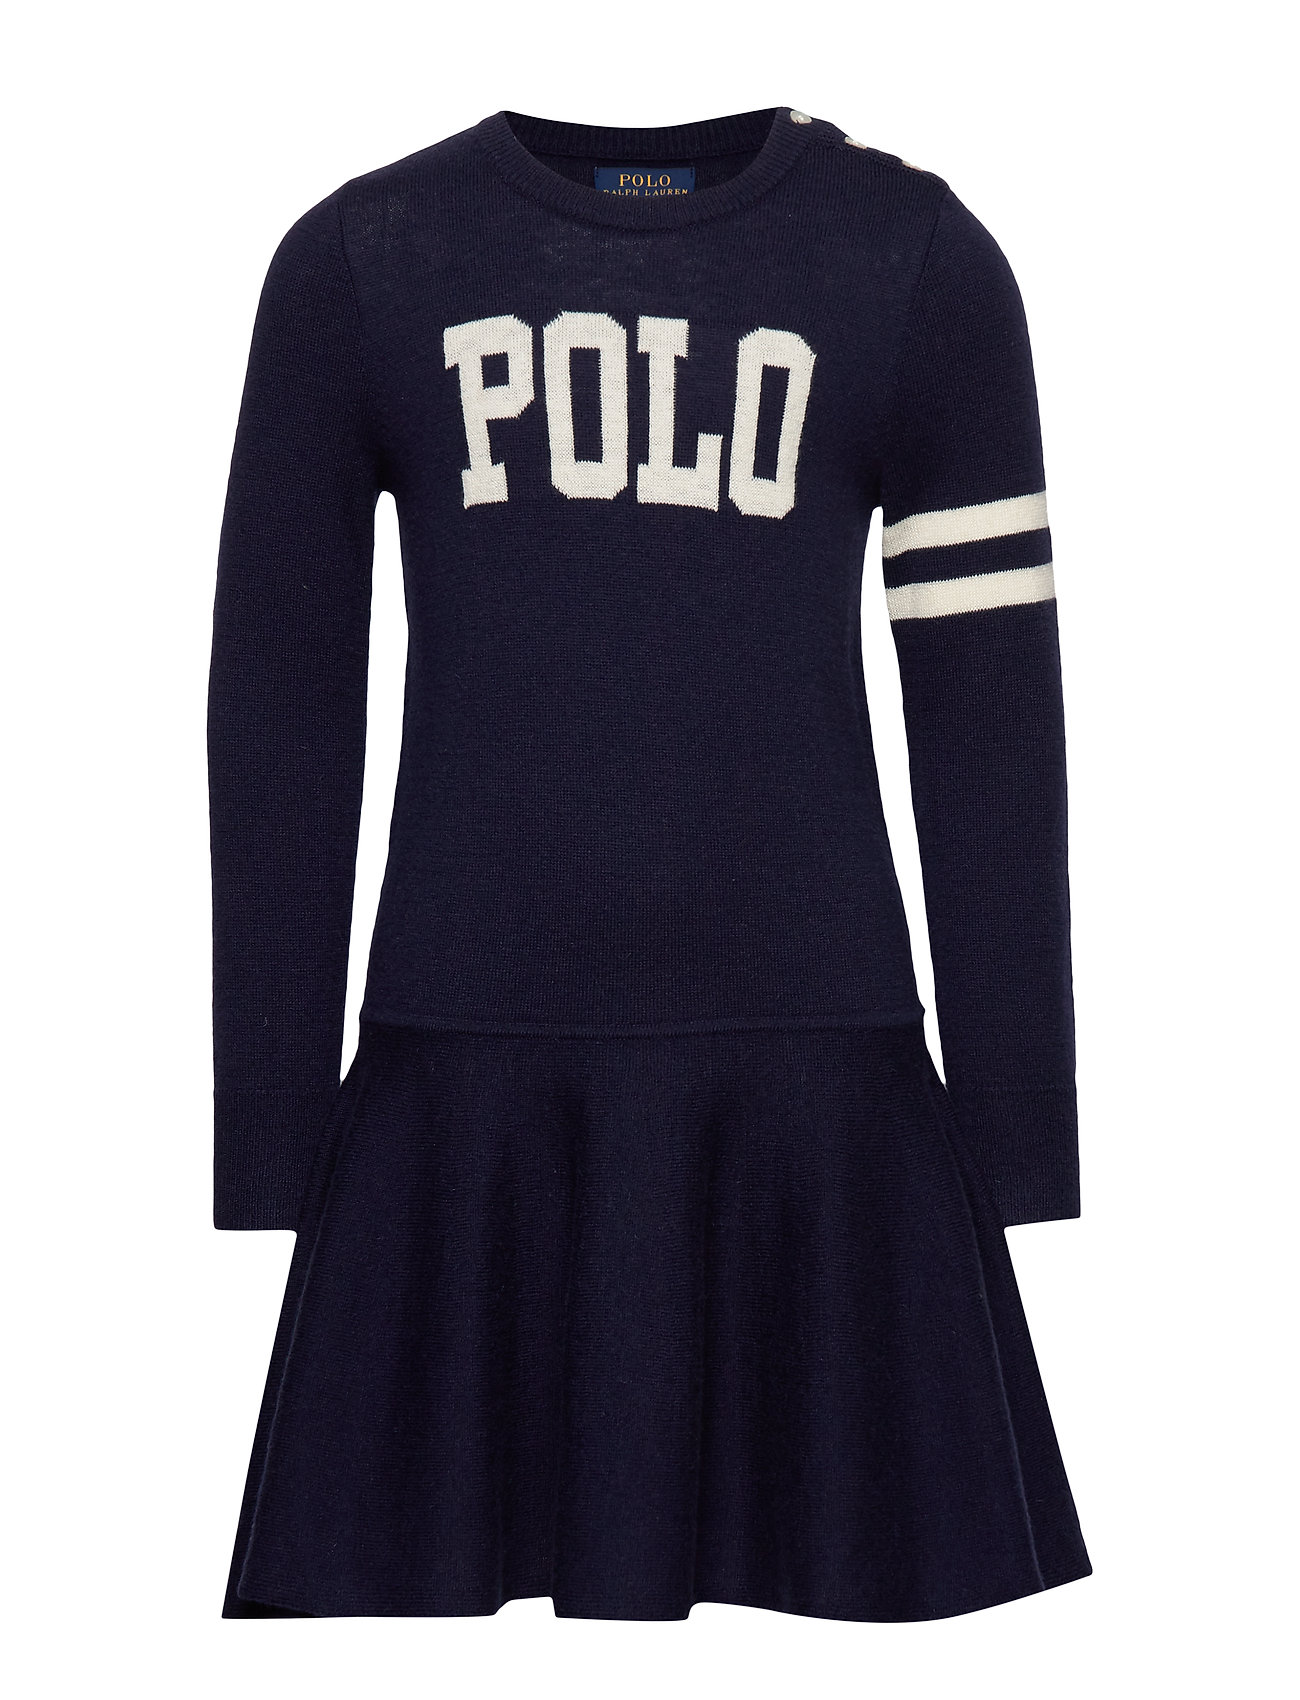 Ralph Lauren Kids POLO SW DRES-DRESSES-SWEATER - RL NAVY